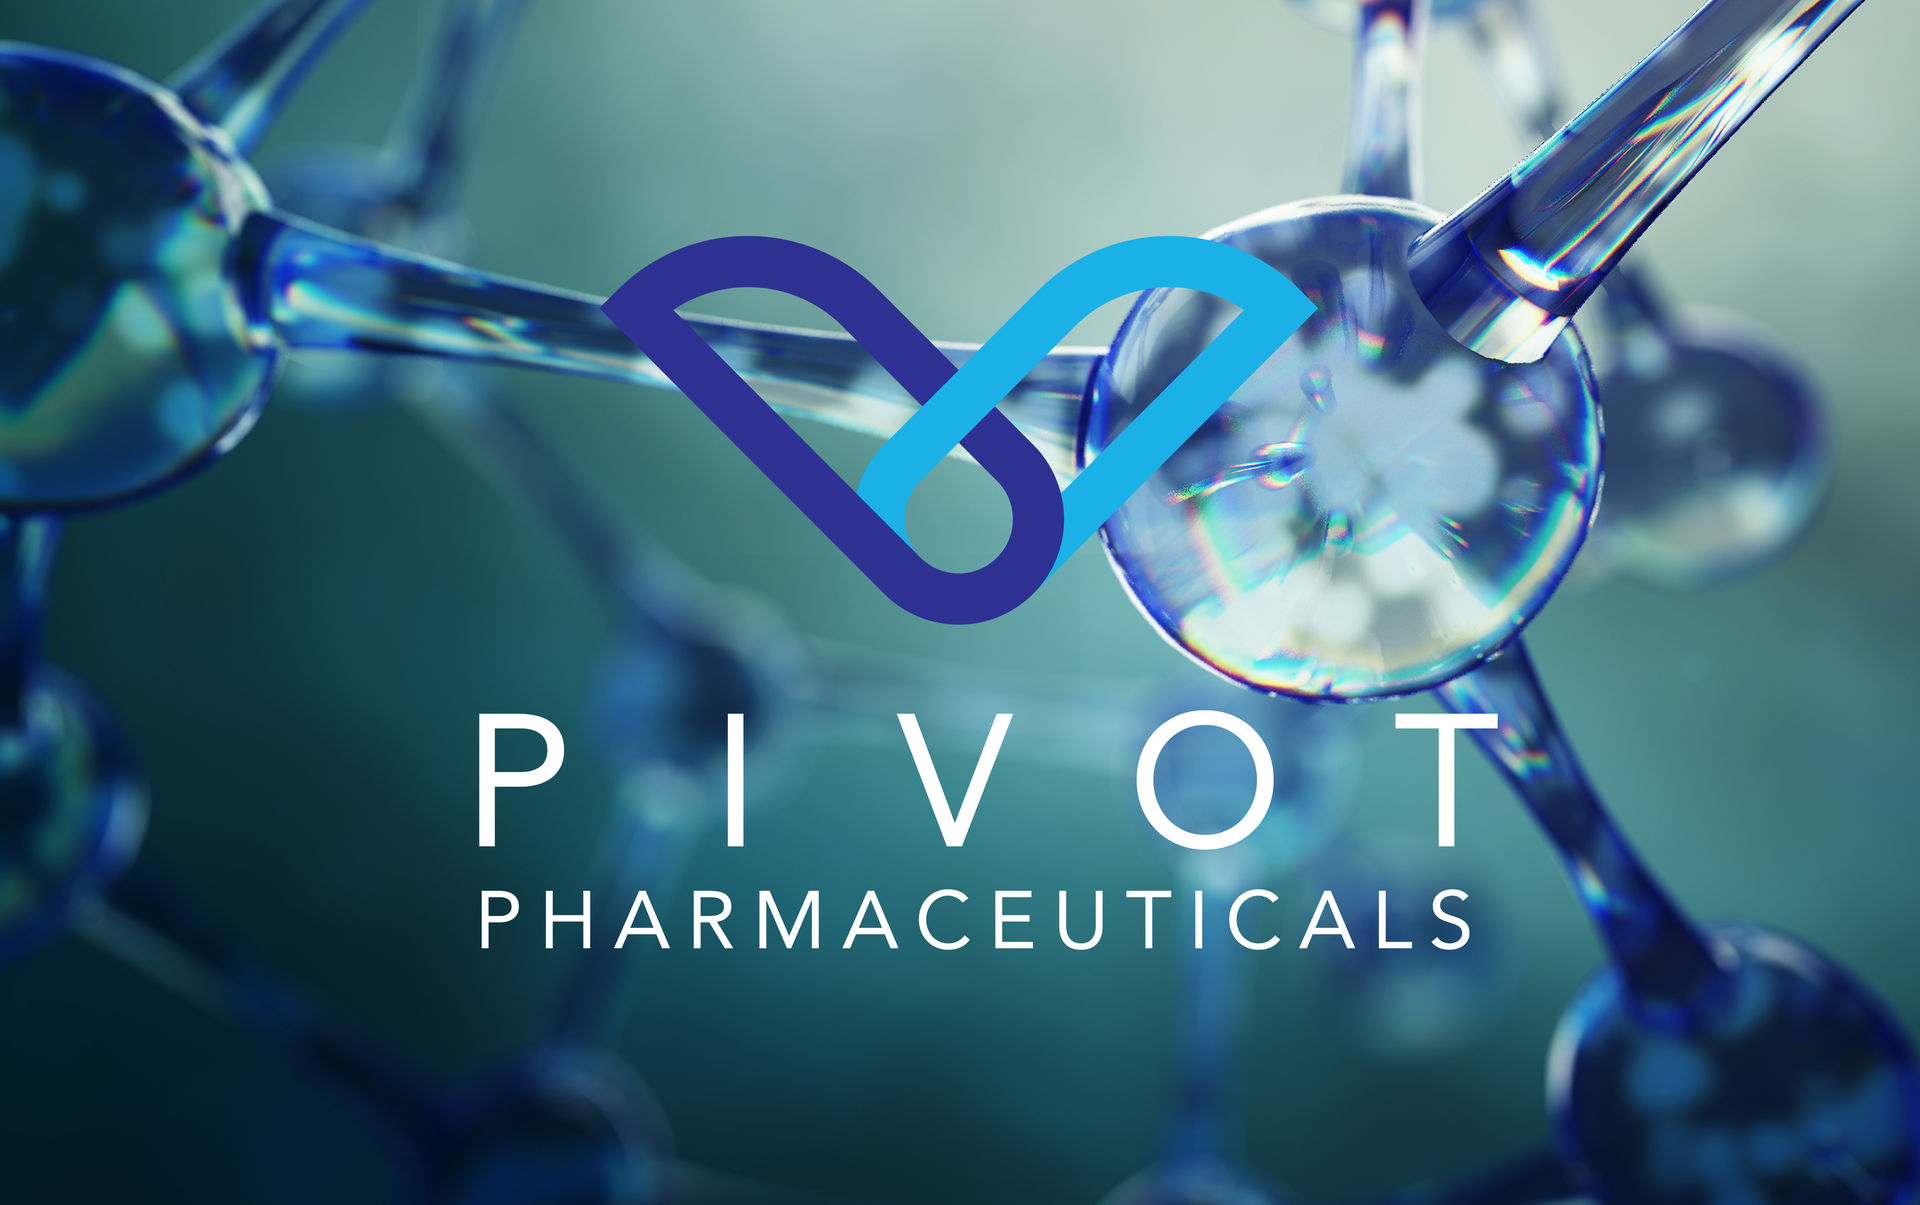 Pivot Pharmaceuticals